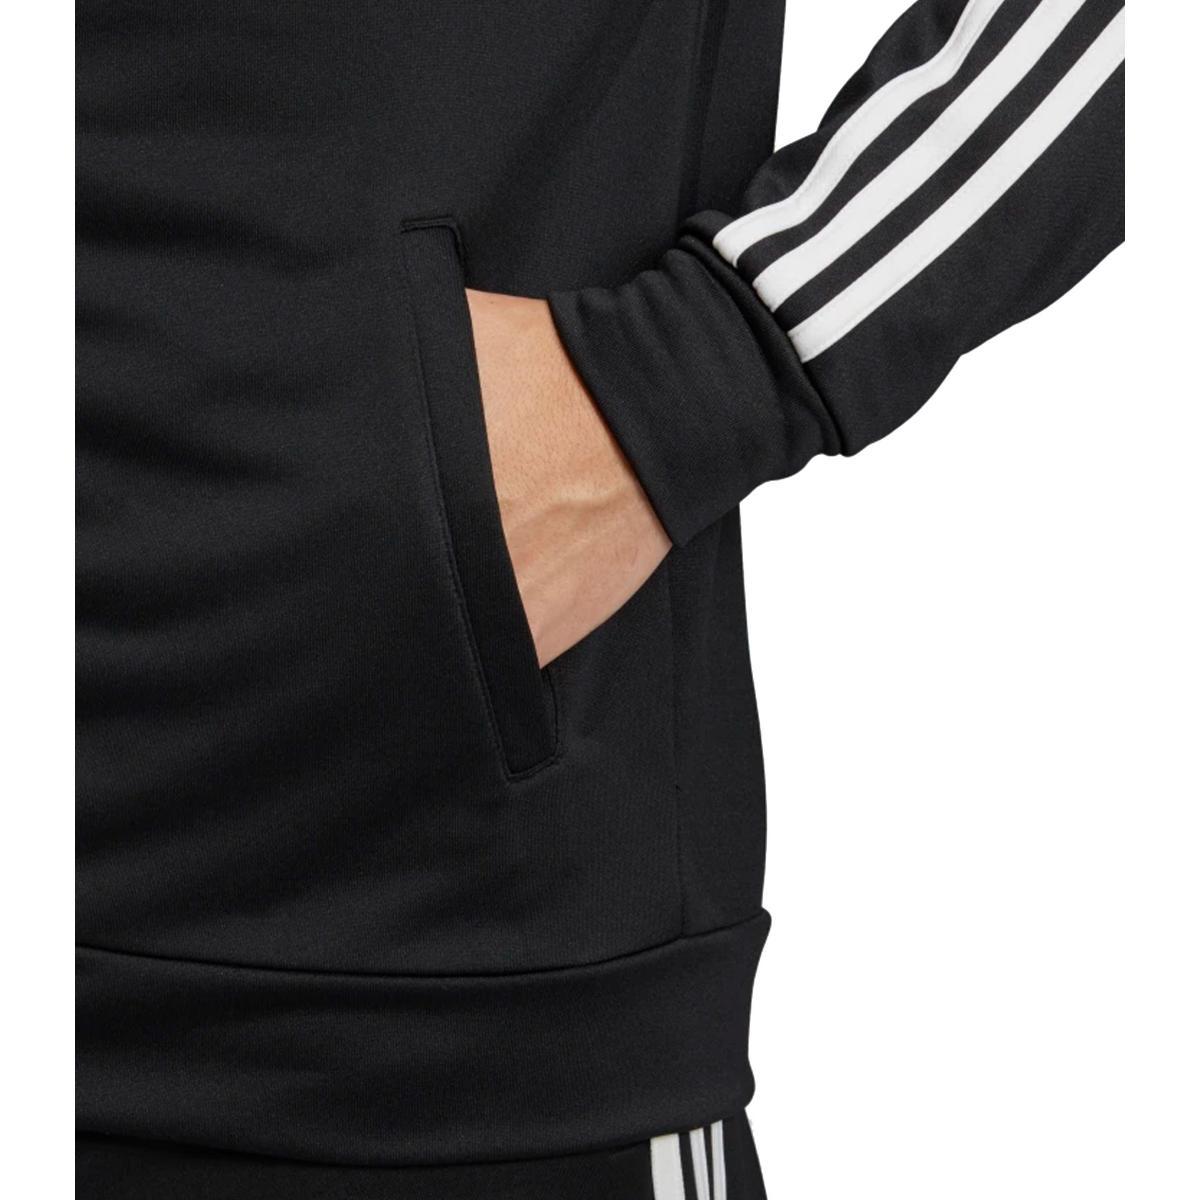 Tuta sportiva Adidas Game Time da uomo rif. DZ7671